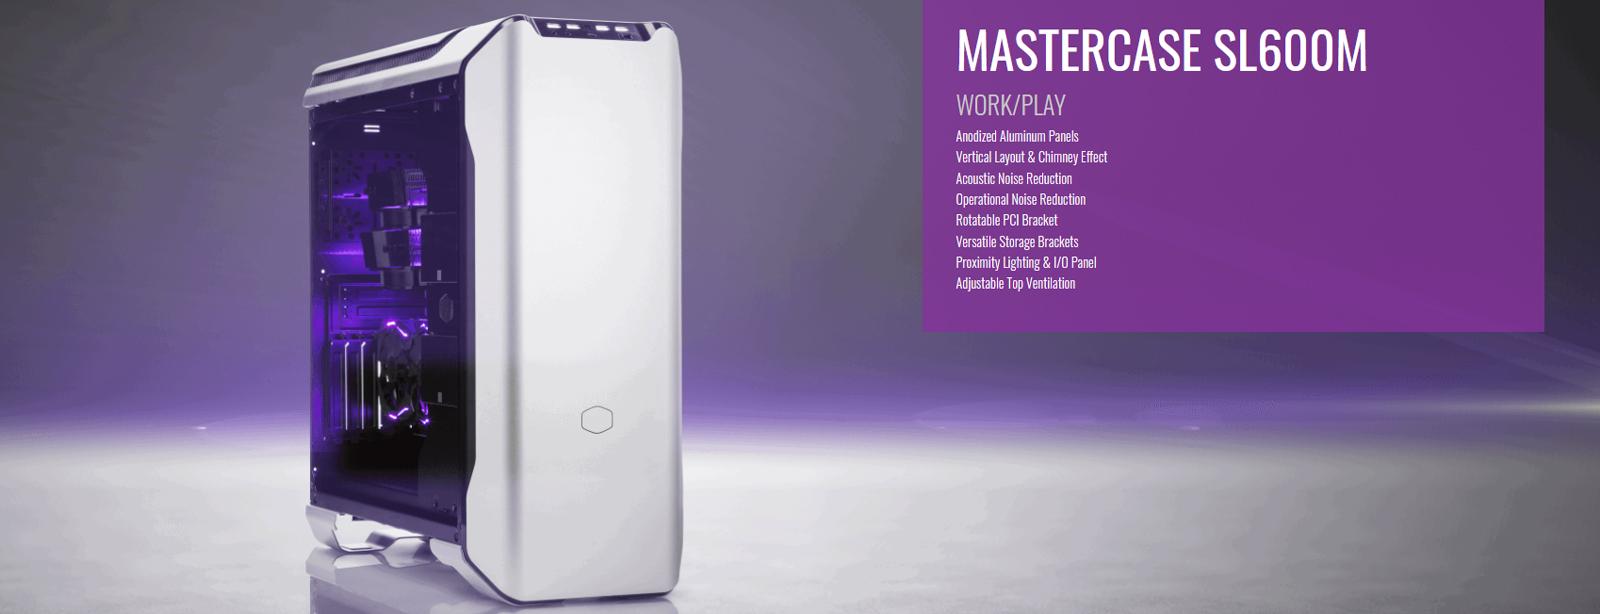 Cooler Master Master Case SL600M (Mid Tower/Màu Trắng) giới thiệu